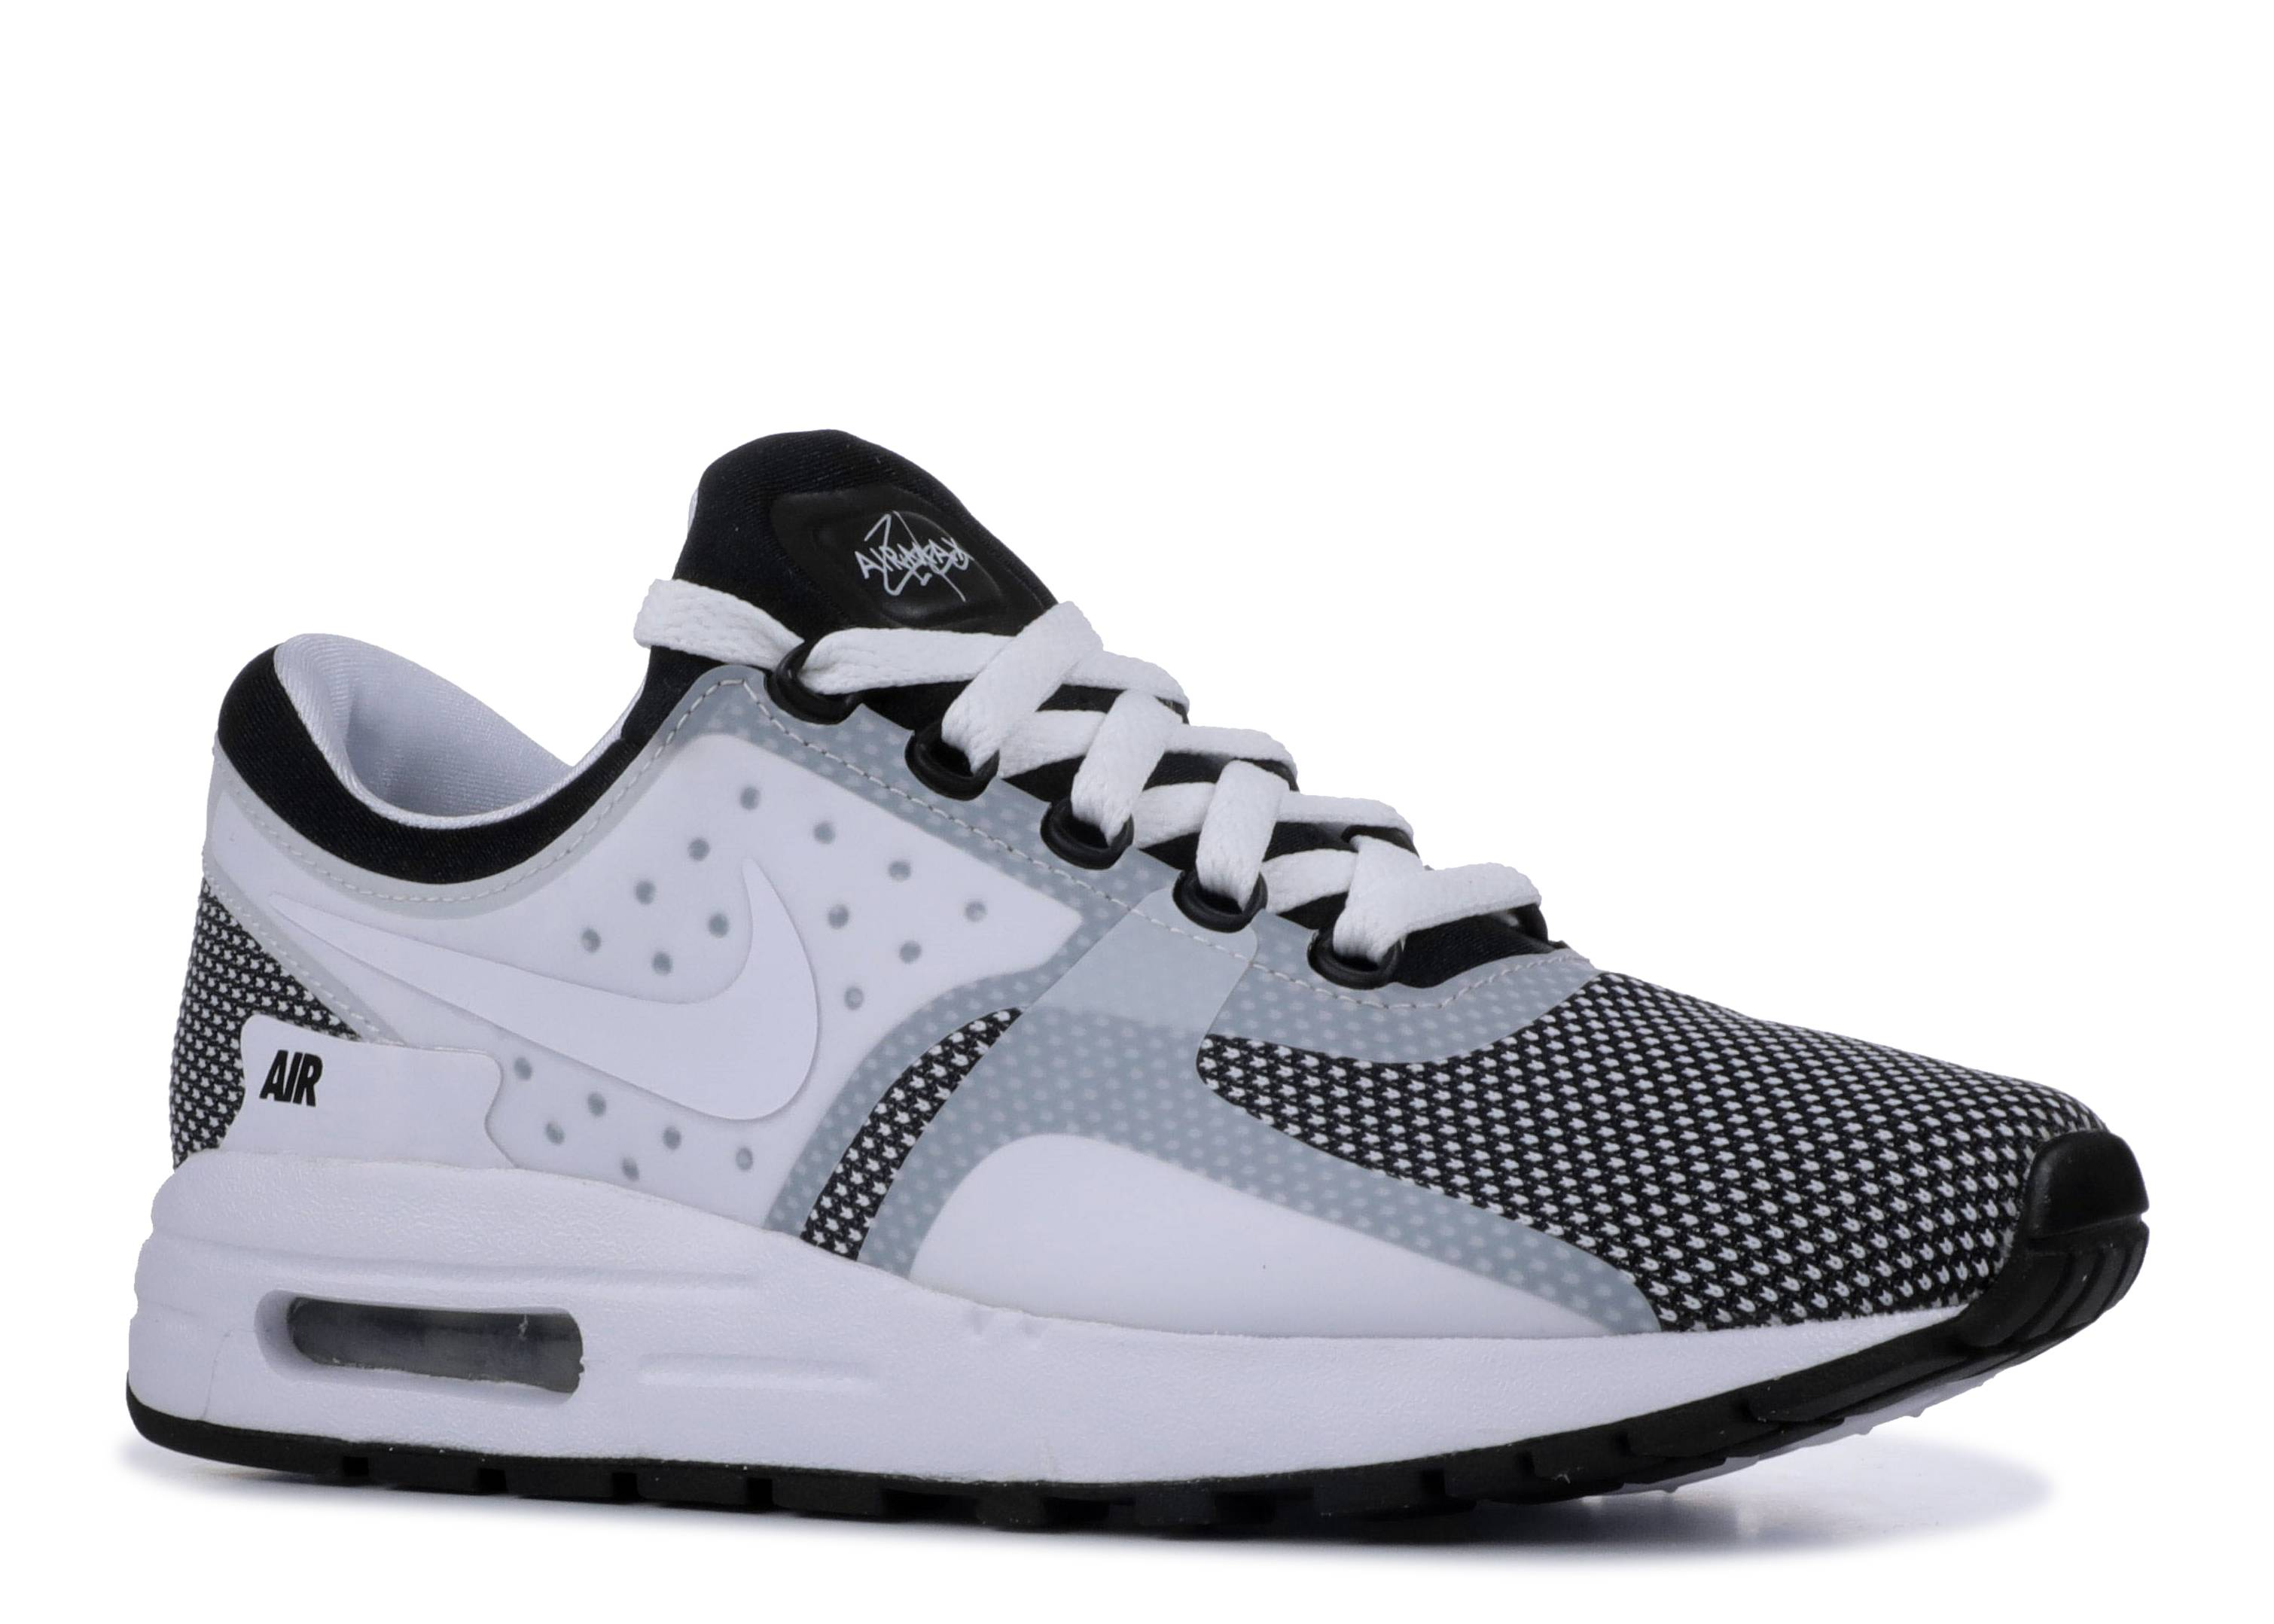 f5e511474c1 Nike Air Max Zero Essential Gs - Nike - 881224 001 - black wolf  grey white white